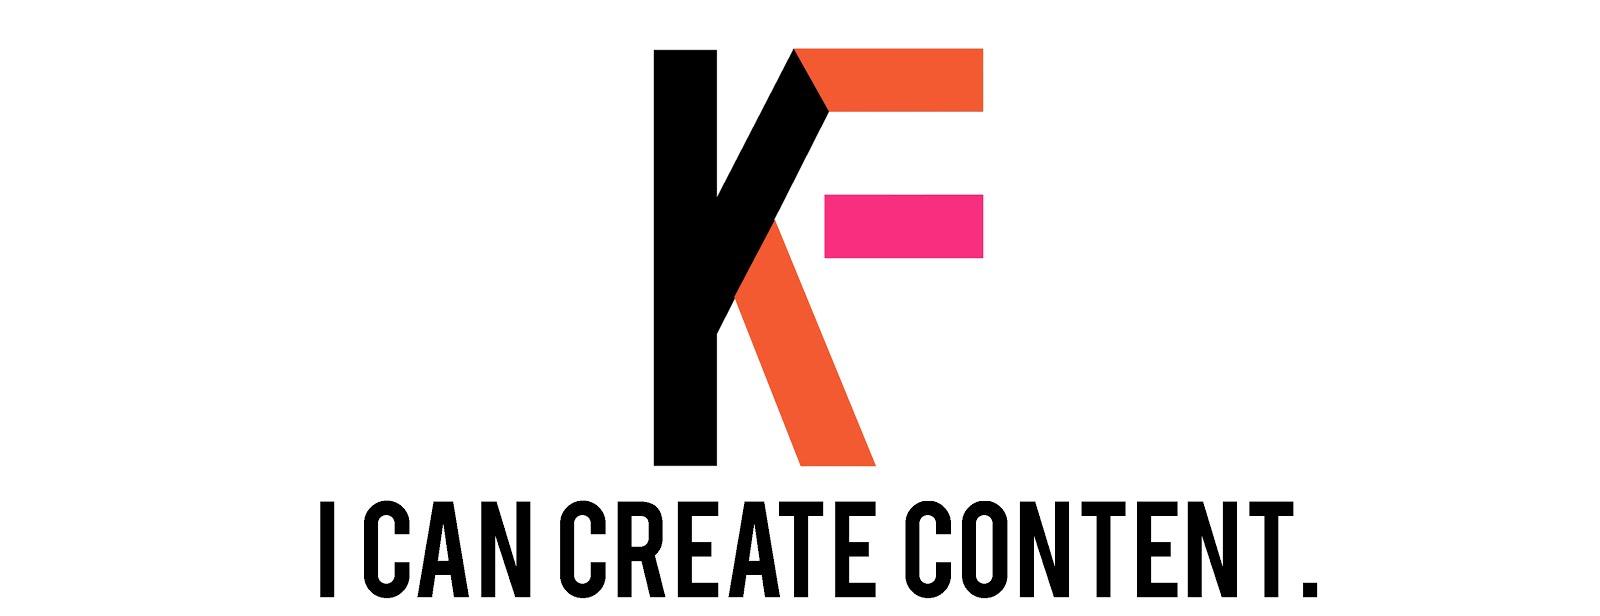 bernhardt logo. Taste Makers Of The Fashion Industry: Marchesa Casati And Sarah Bernhardt | KATE FERGUSON Logo